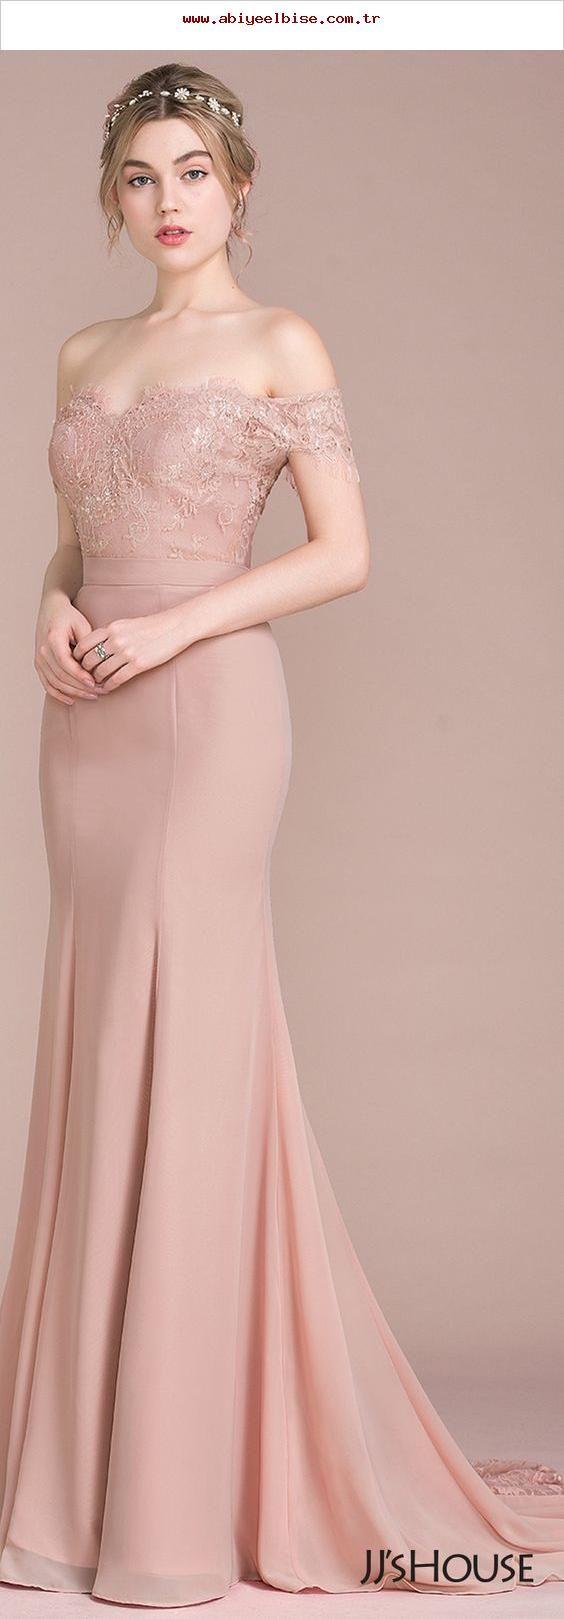 Pudra Rengi Uzun Elbise Kadinlarin Dunyasi Pudra Rengi Uzun Elbise Kadinlarin Dunyasi Dunyas Elbise Pudra Uzun Elbise Elbise Elbise Modelleri